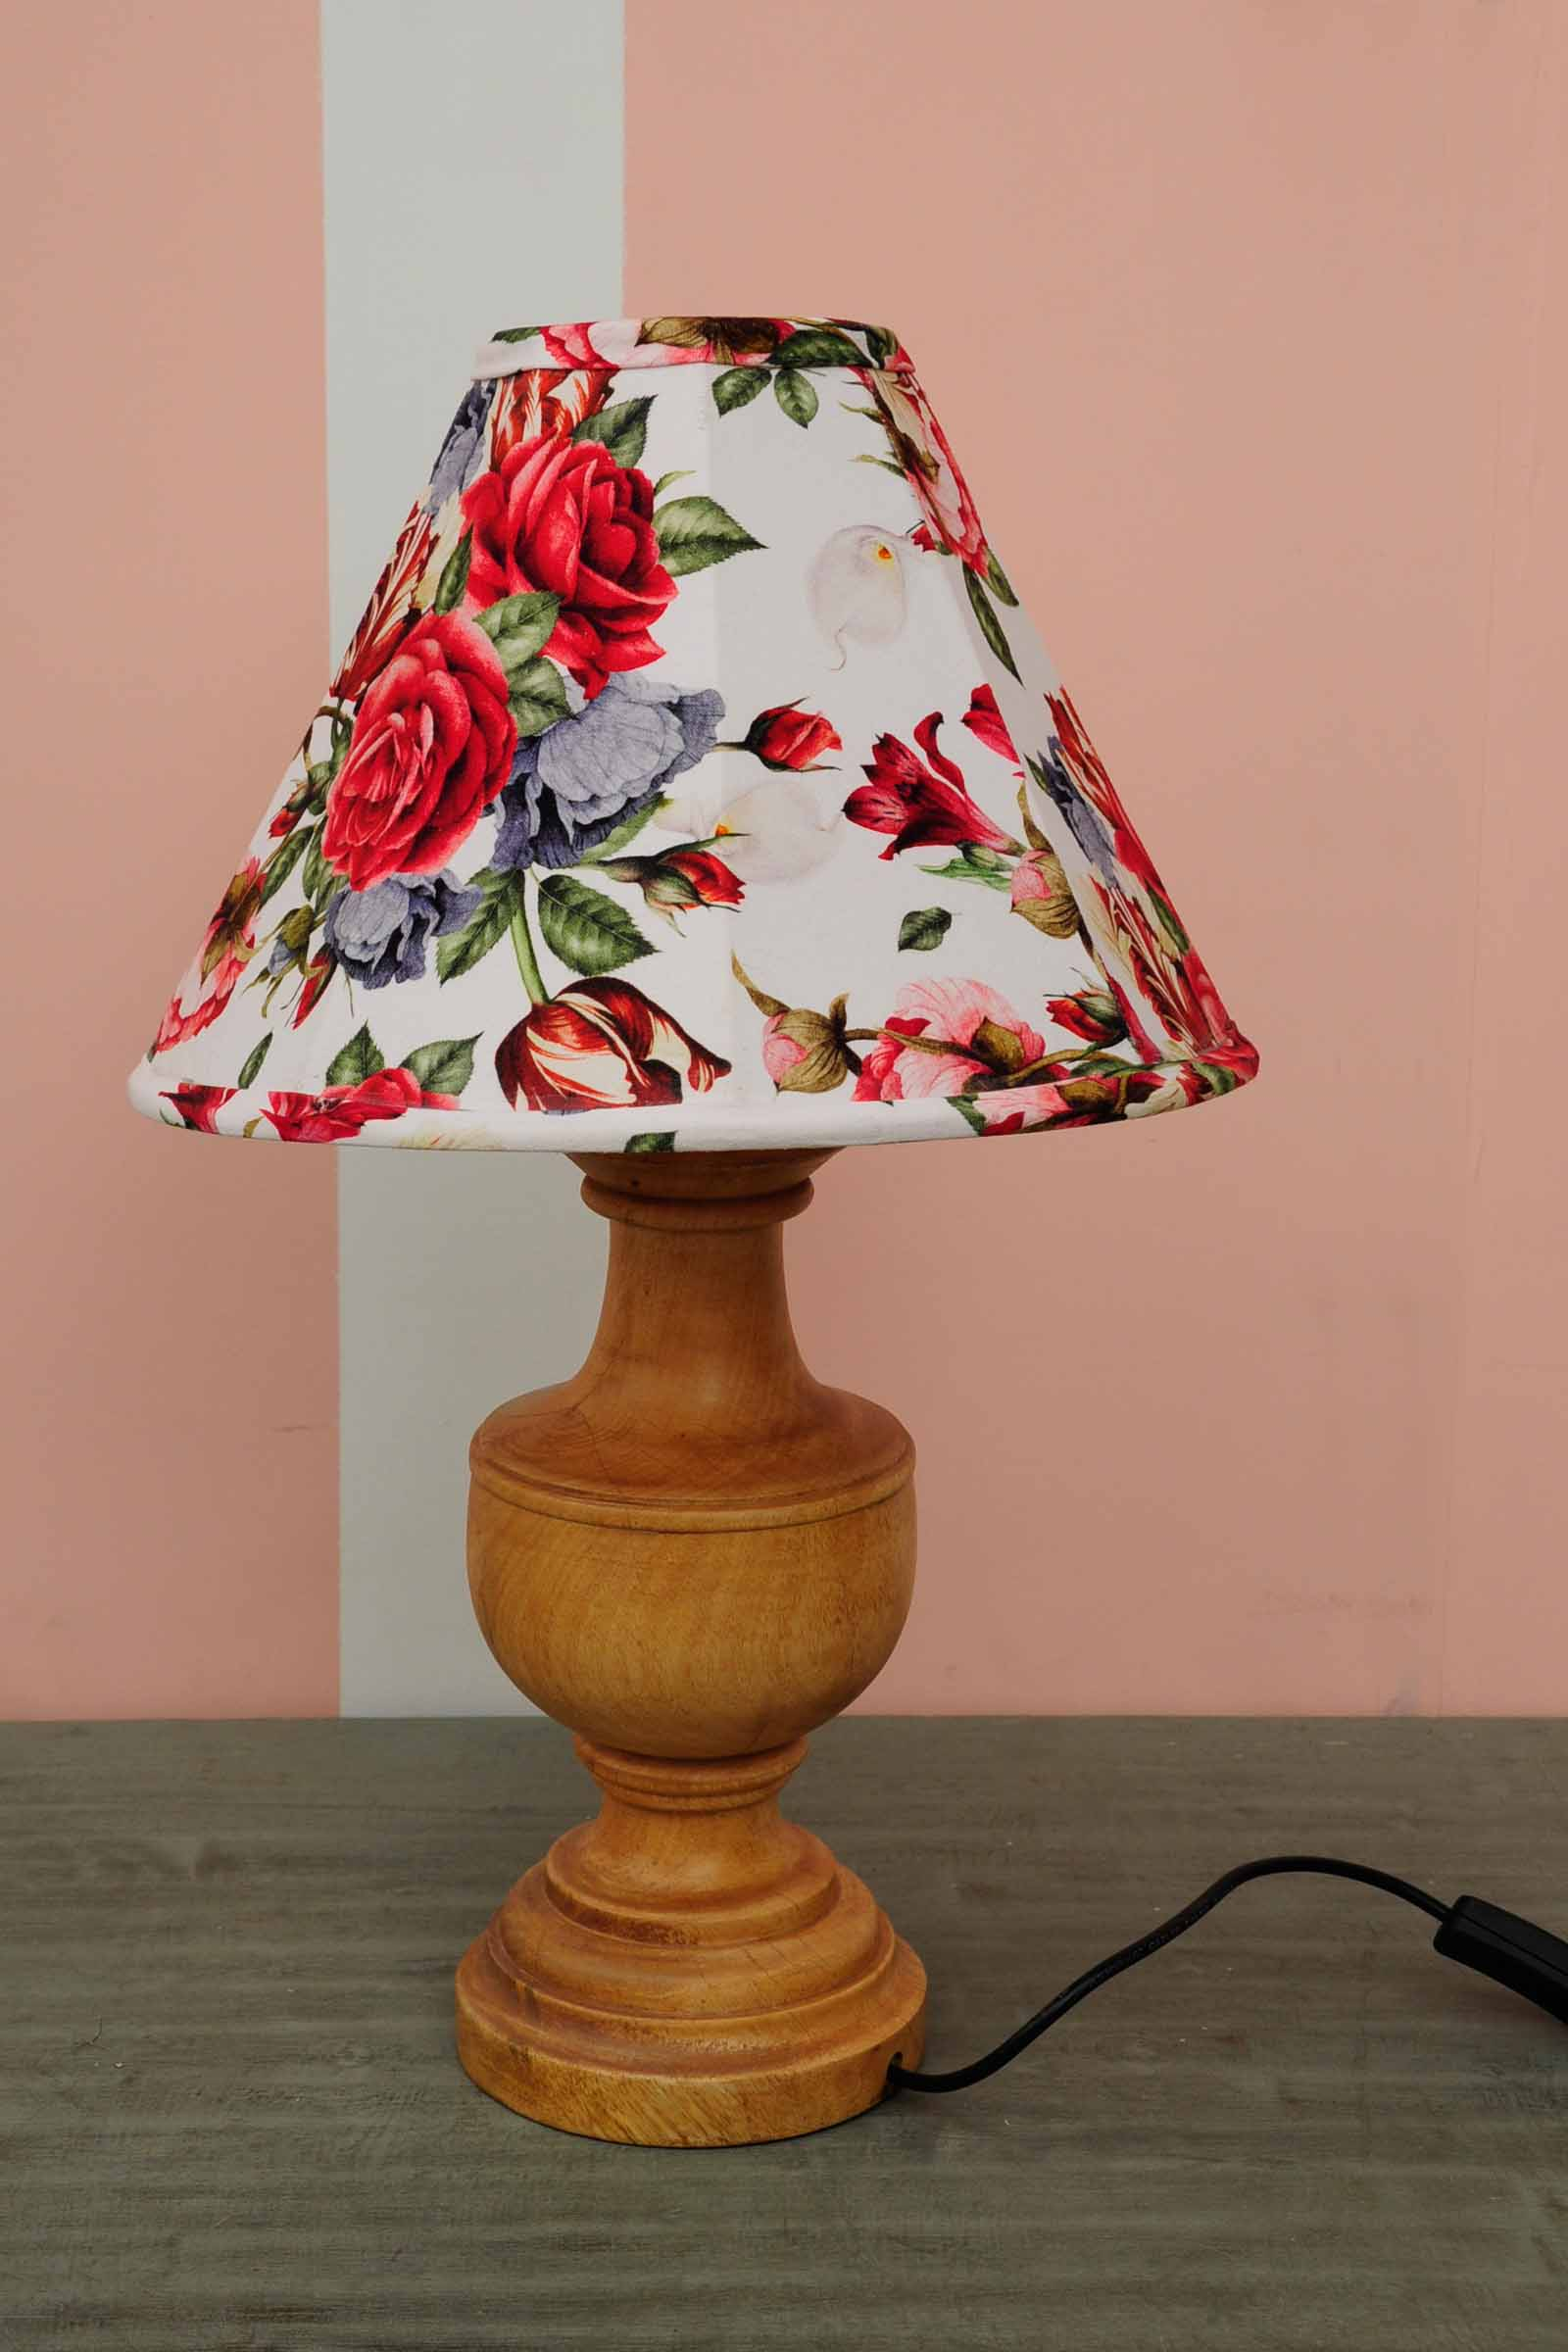 Mini Bouquet Medium Lamp Shade